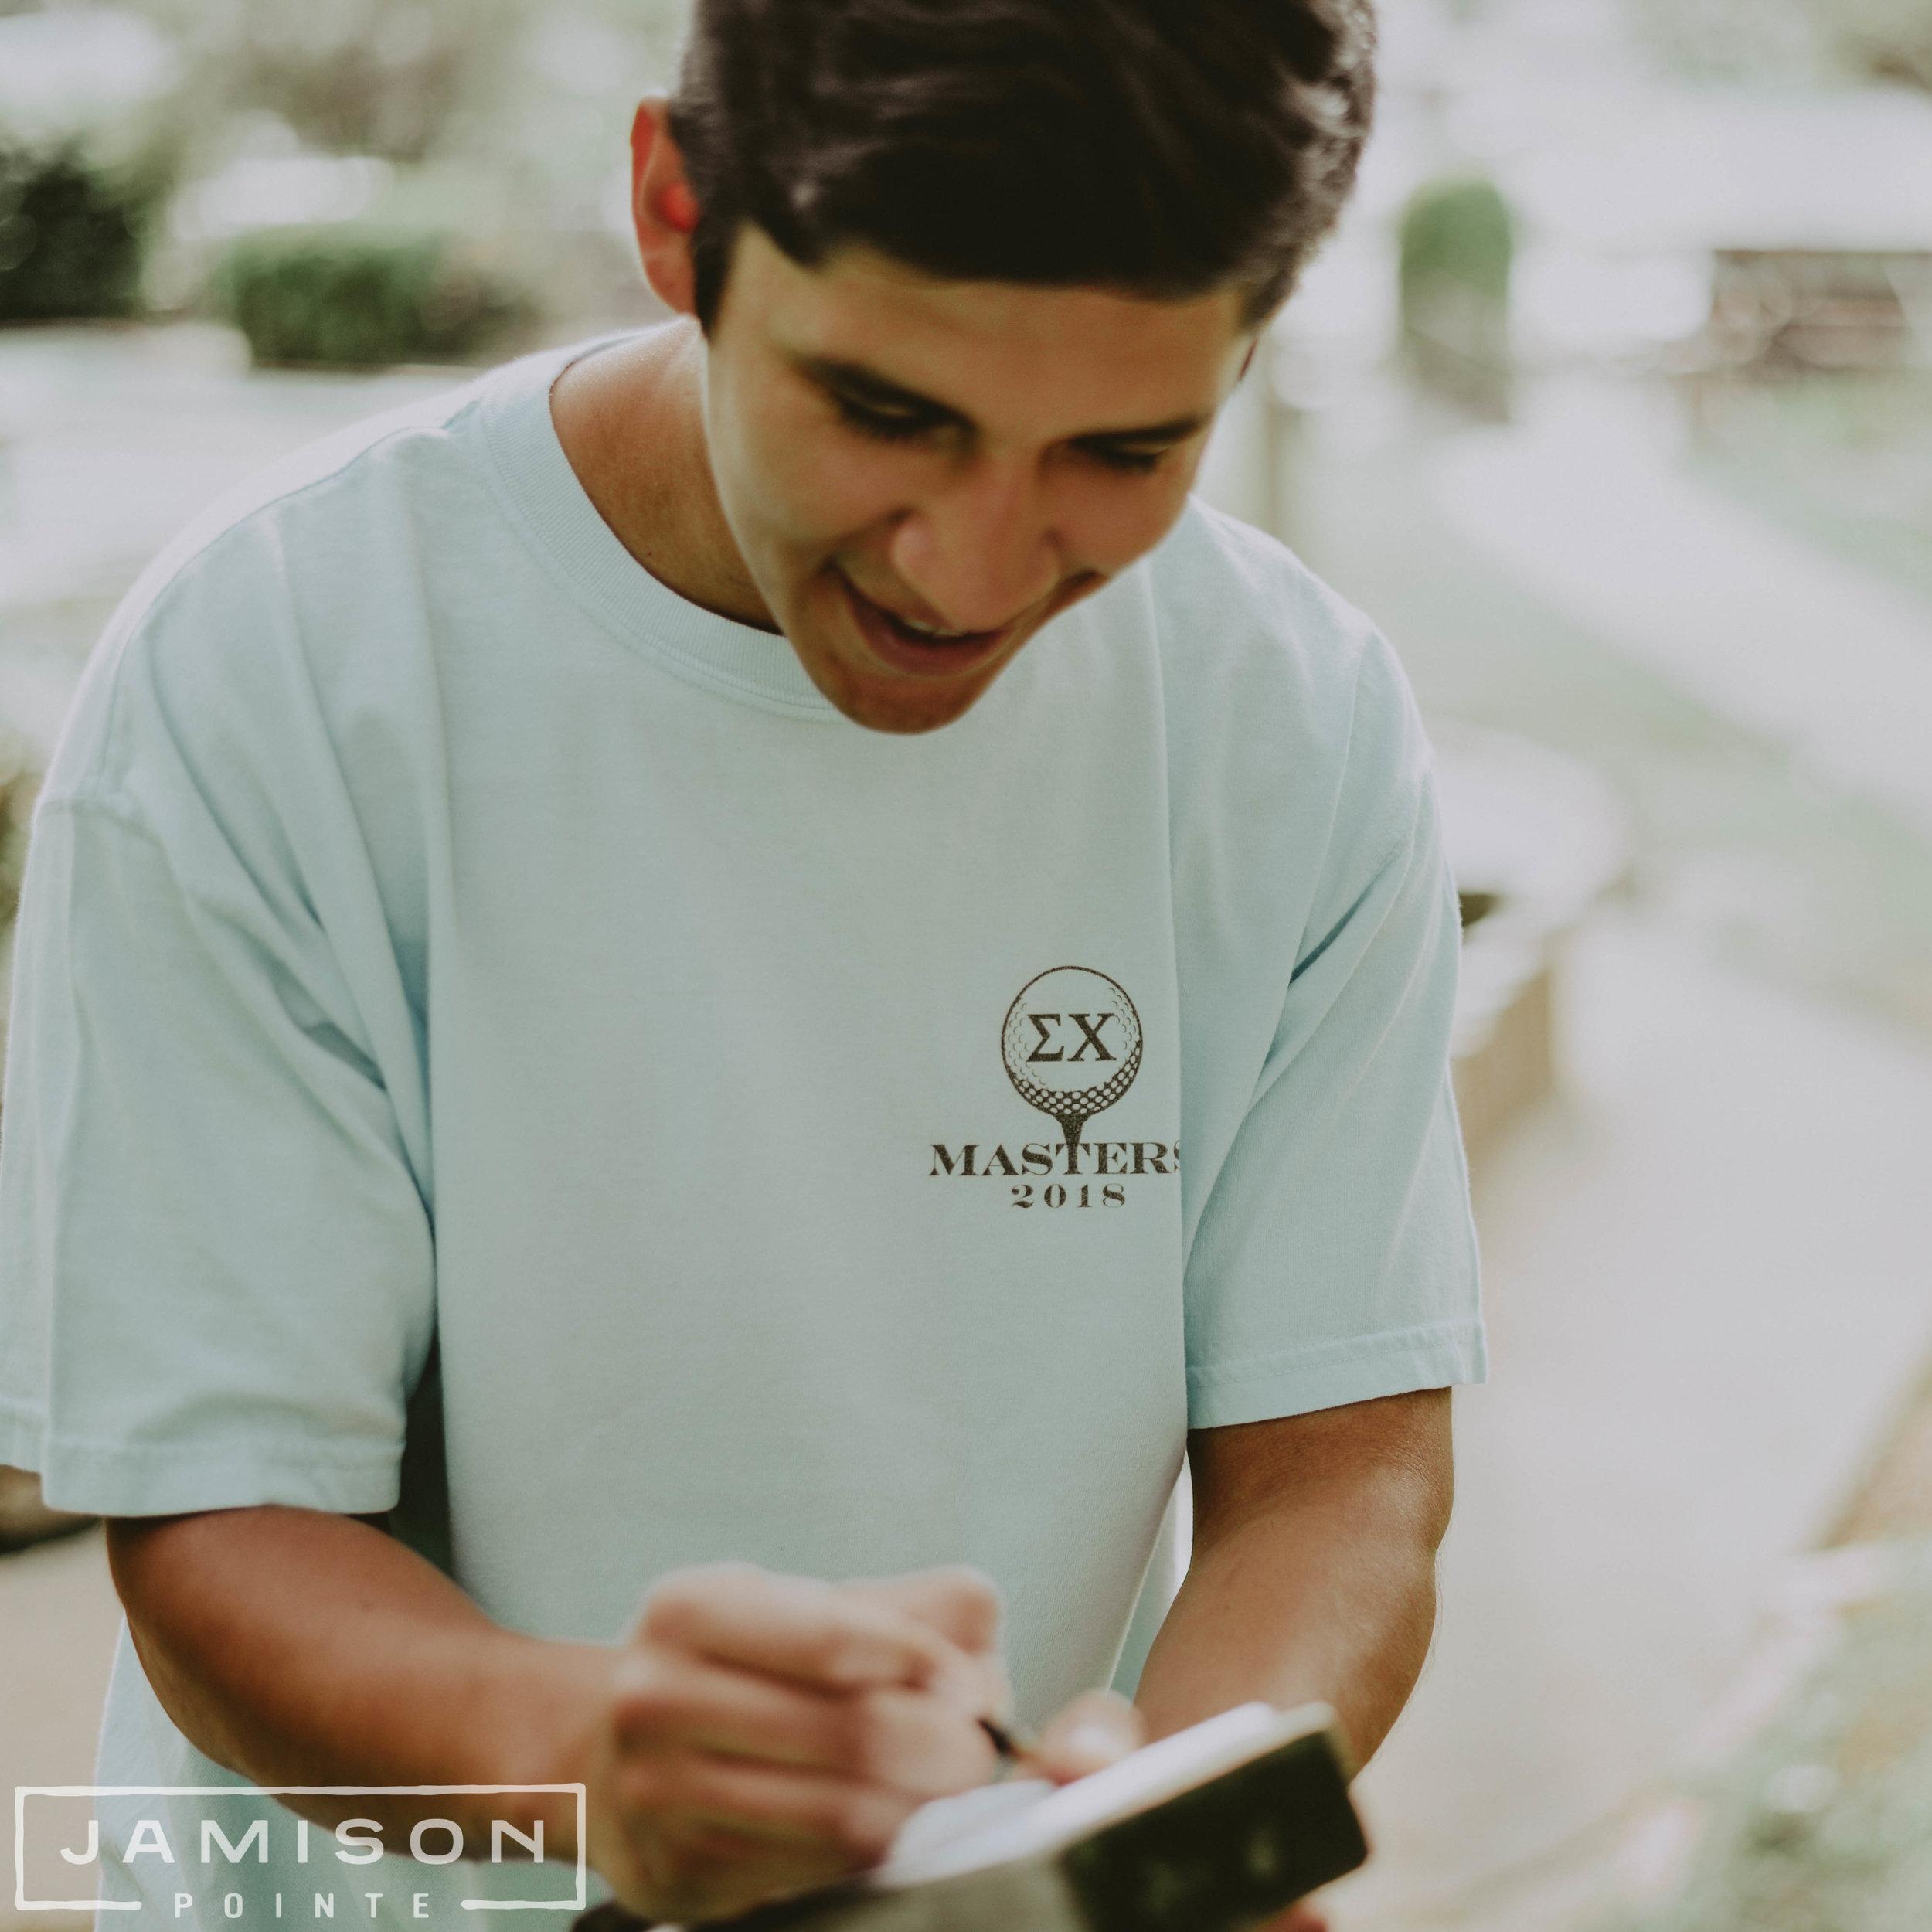 Sigma Chi Masters T-shirt